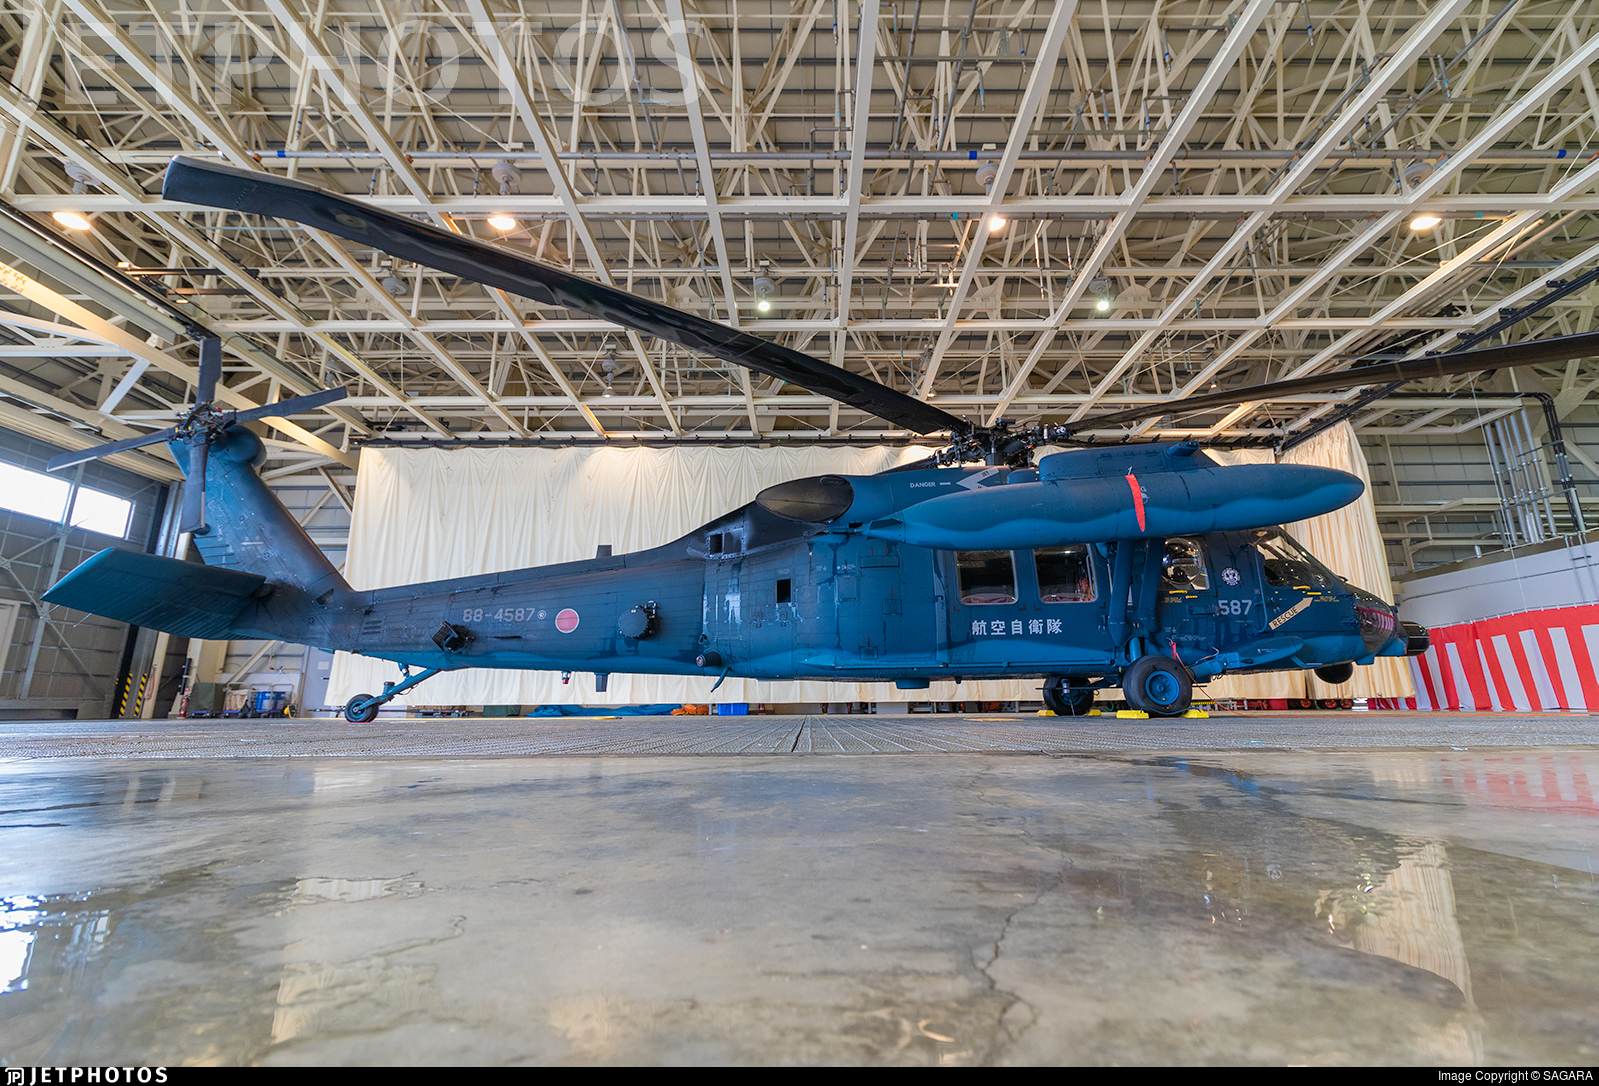 88-4587 - Mitsubishi UH-60J - Japan - Air Self Defence Force (JASDF)